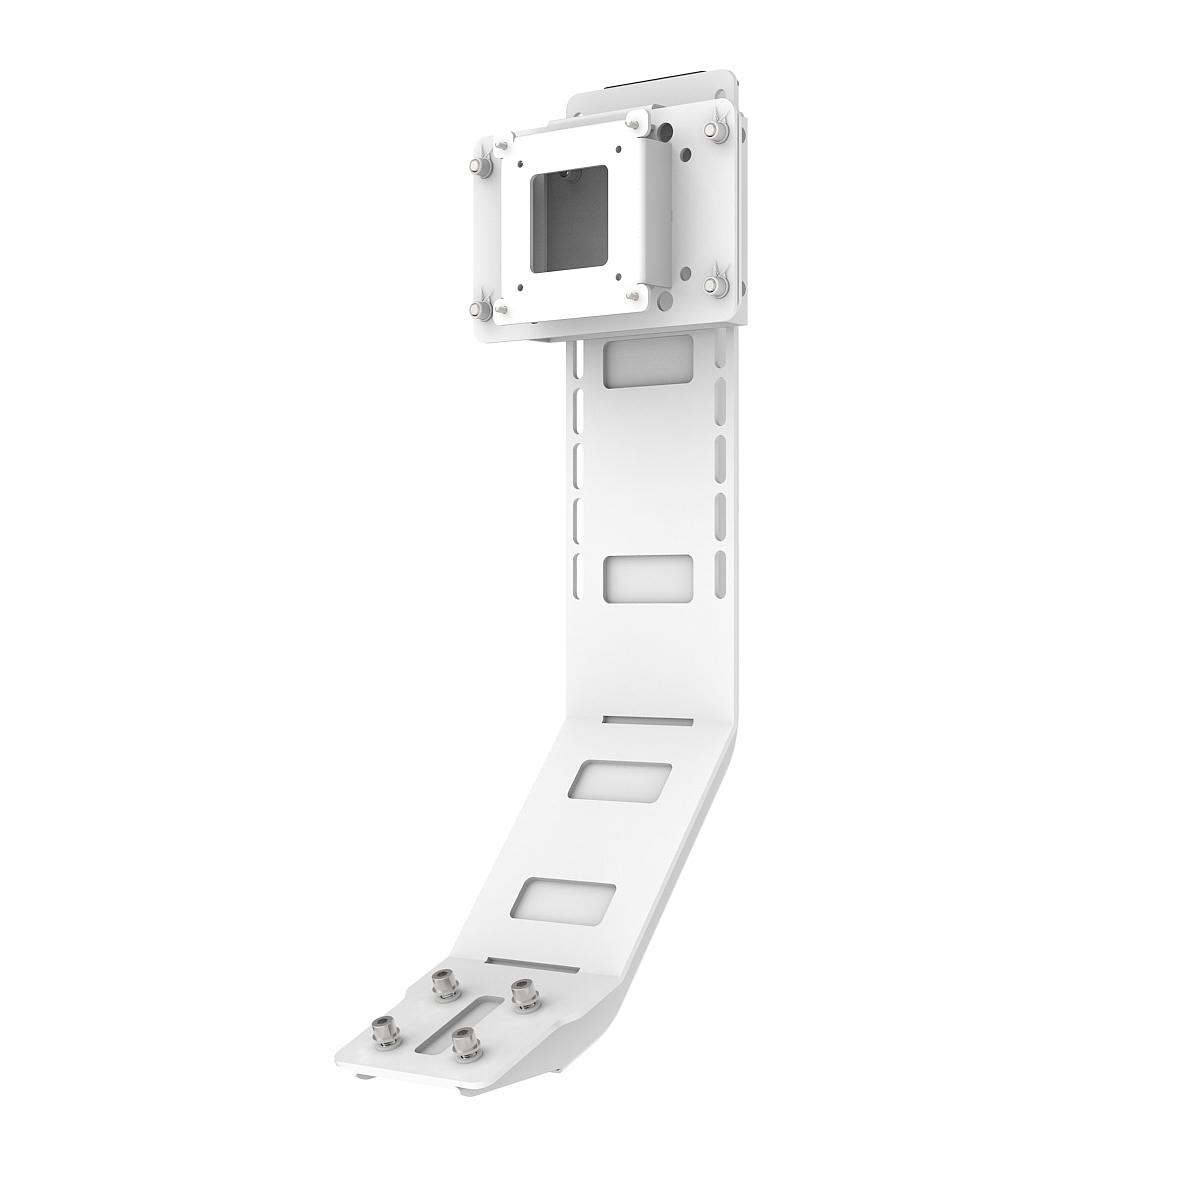 B1 / P1 / C1 Chassis Monitor Stand White